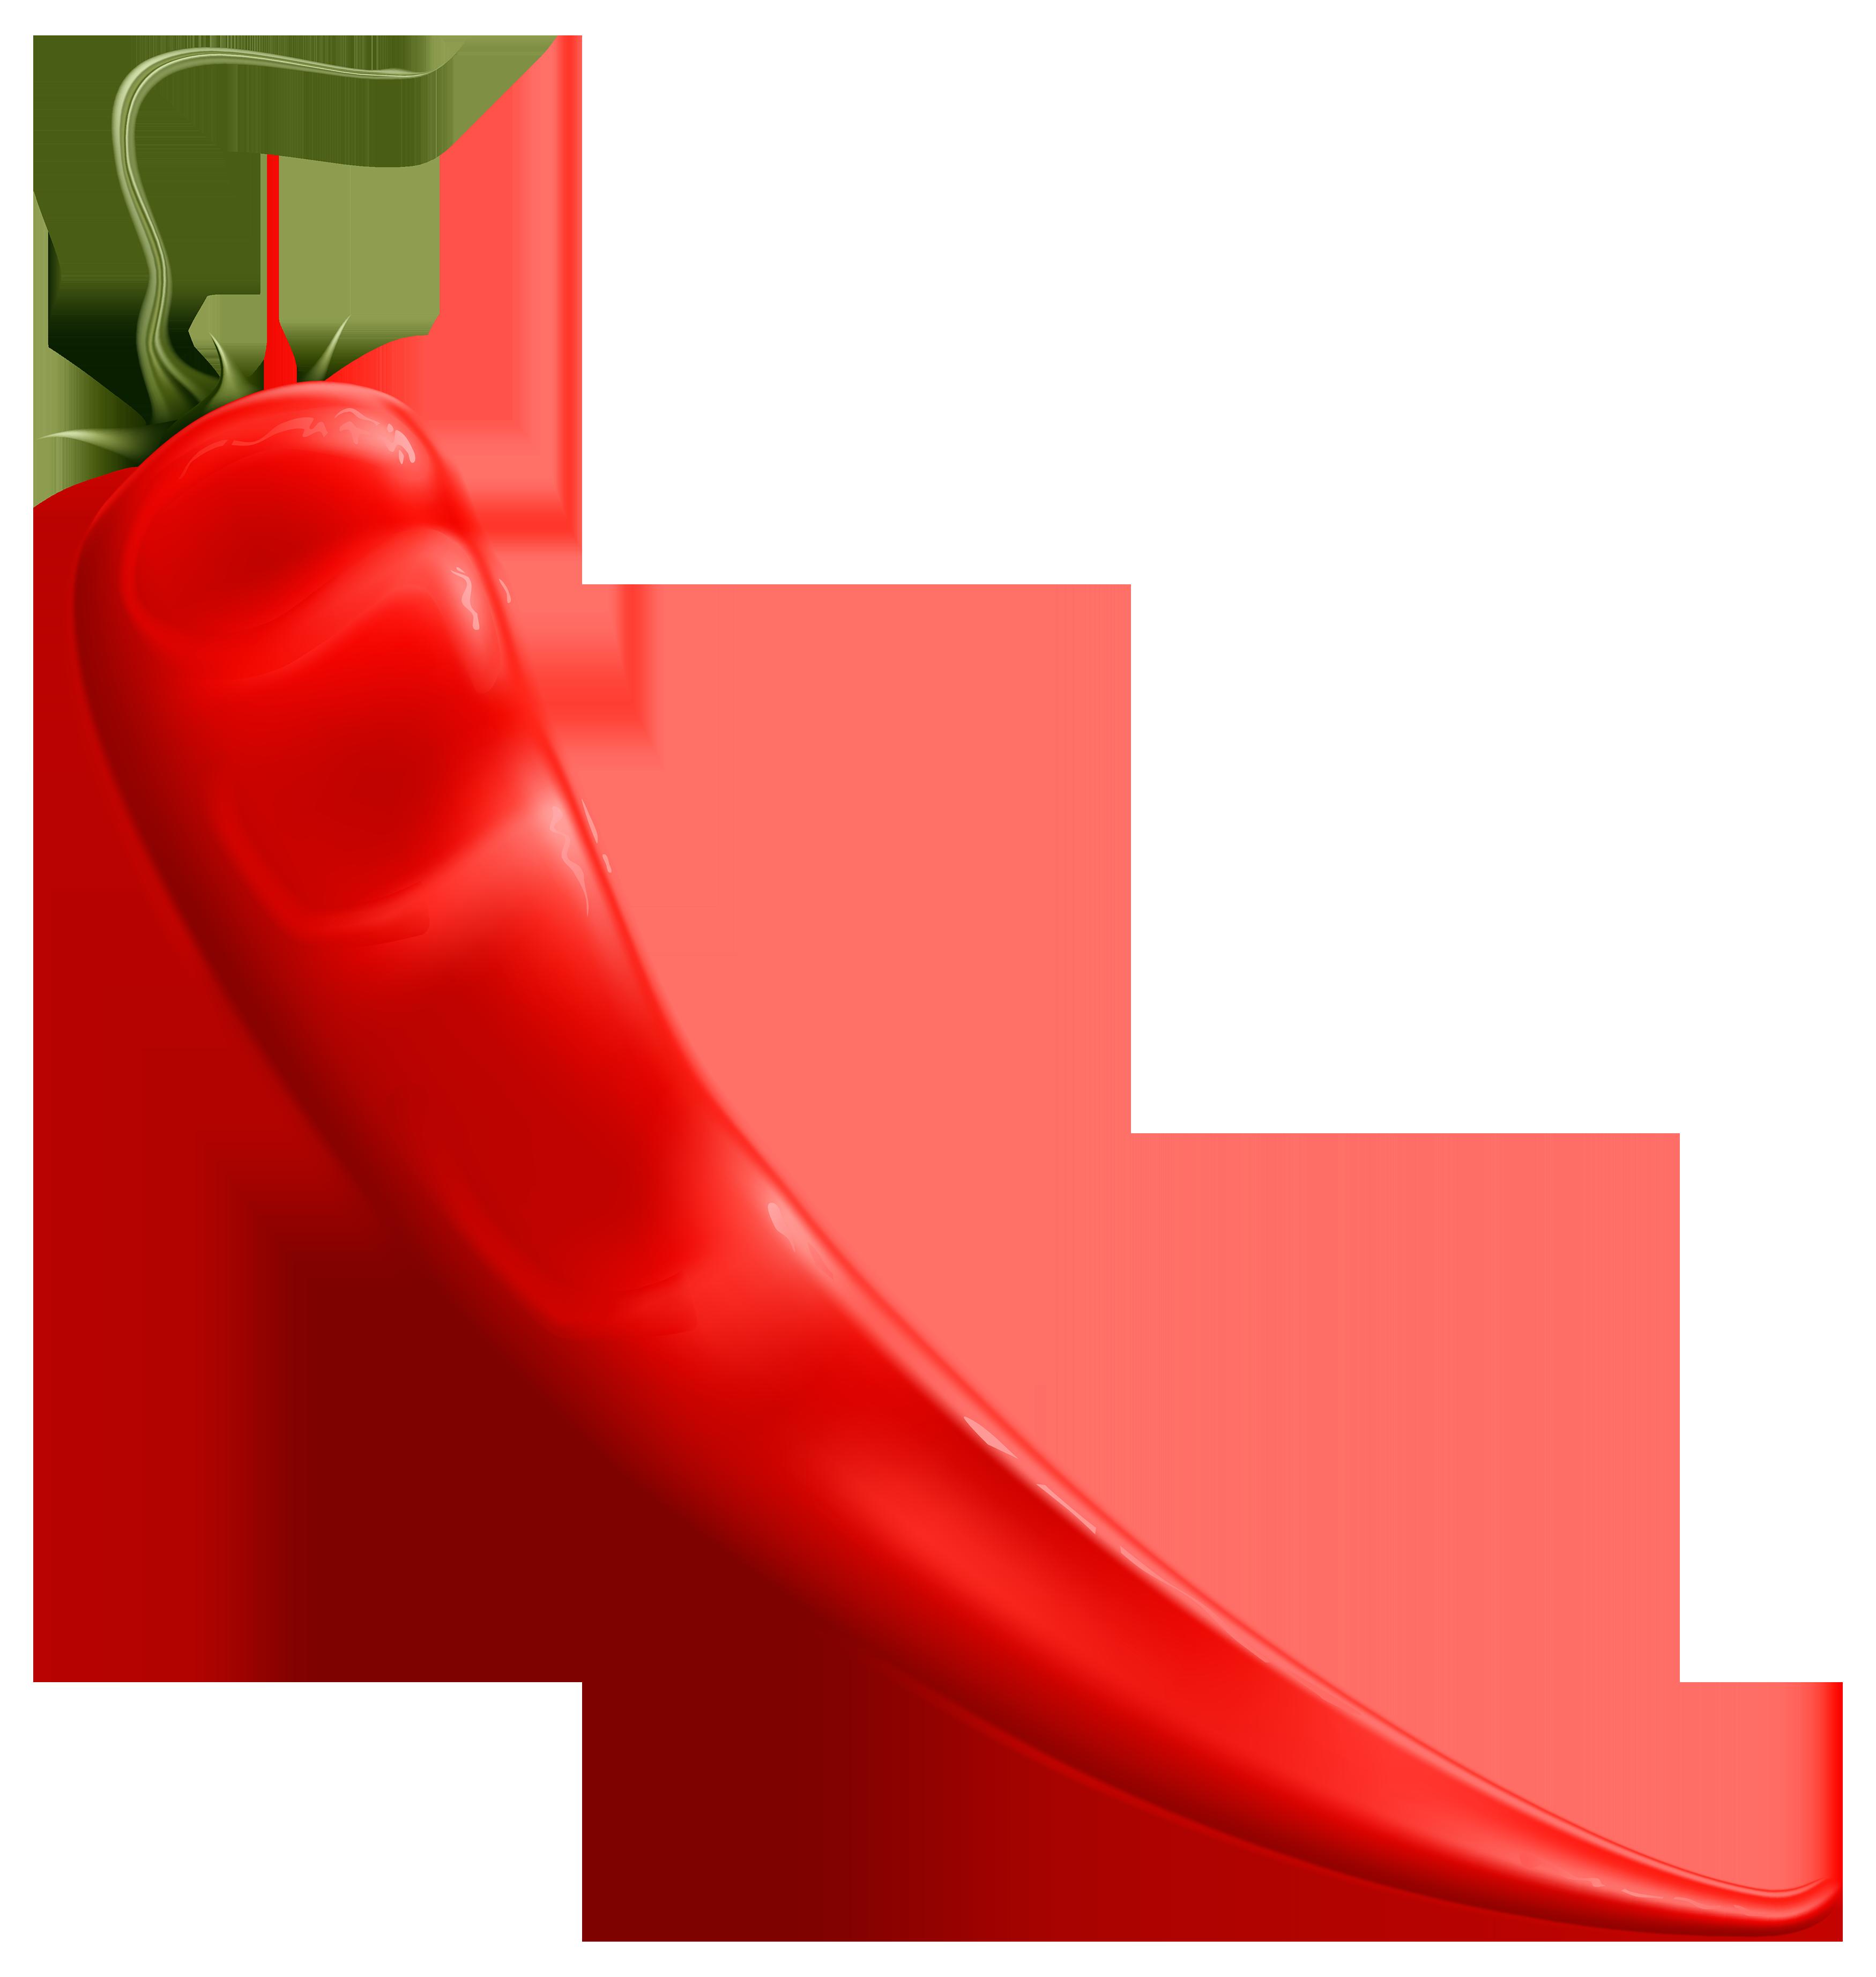 Chili pepper free clipart